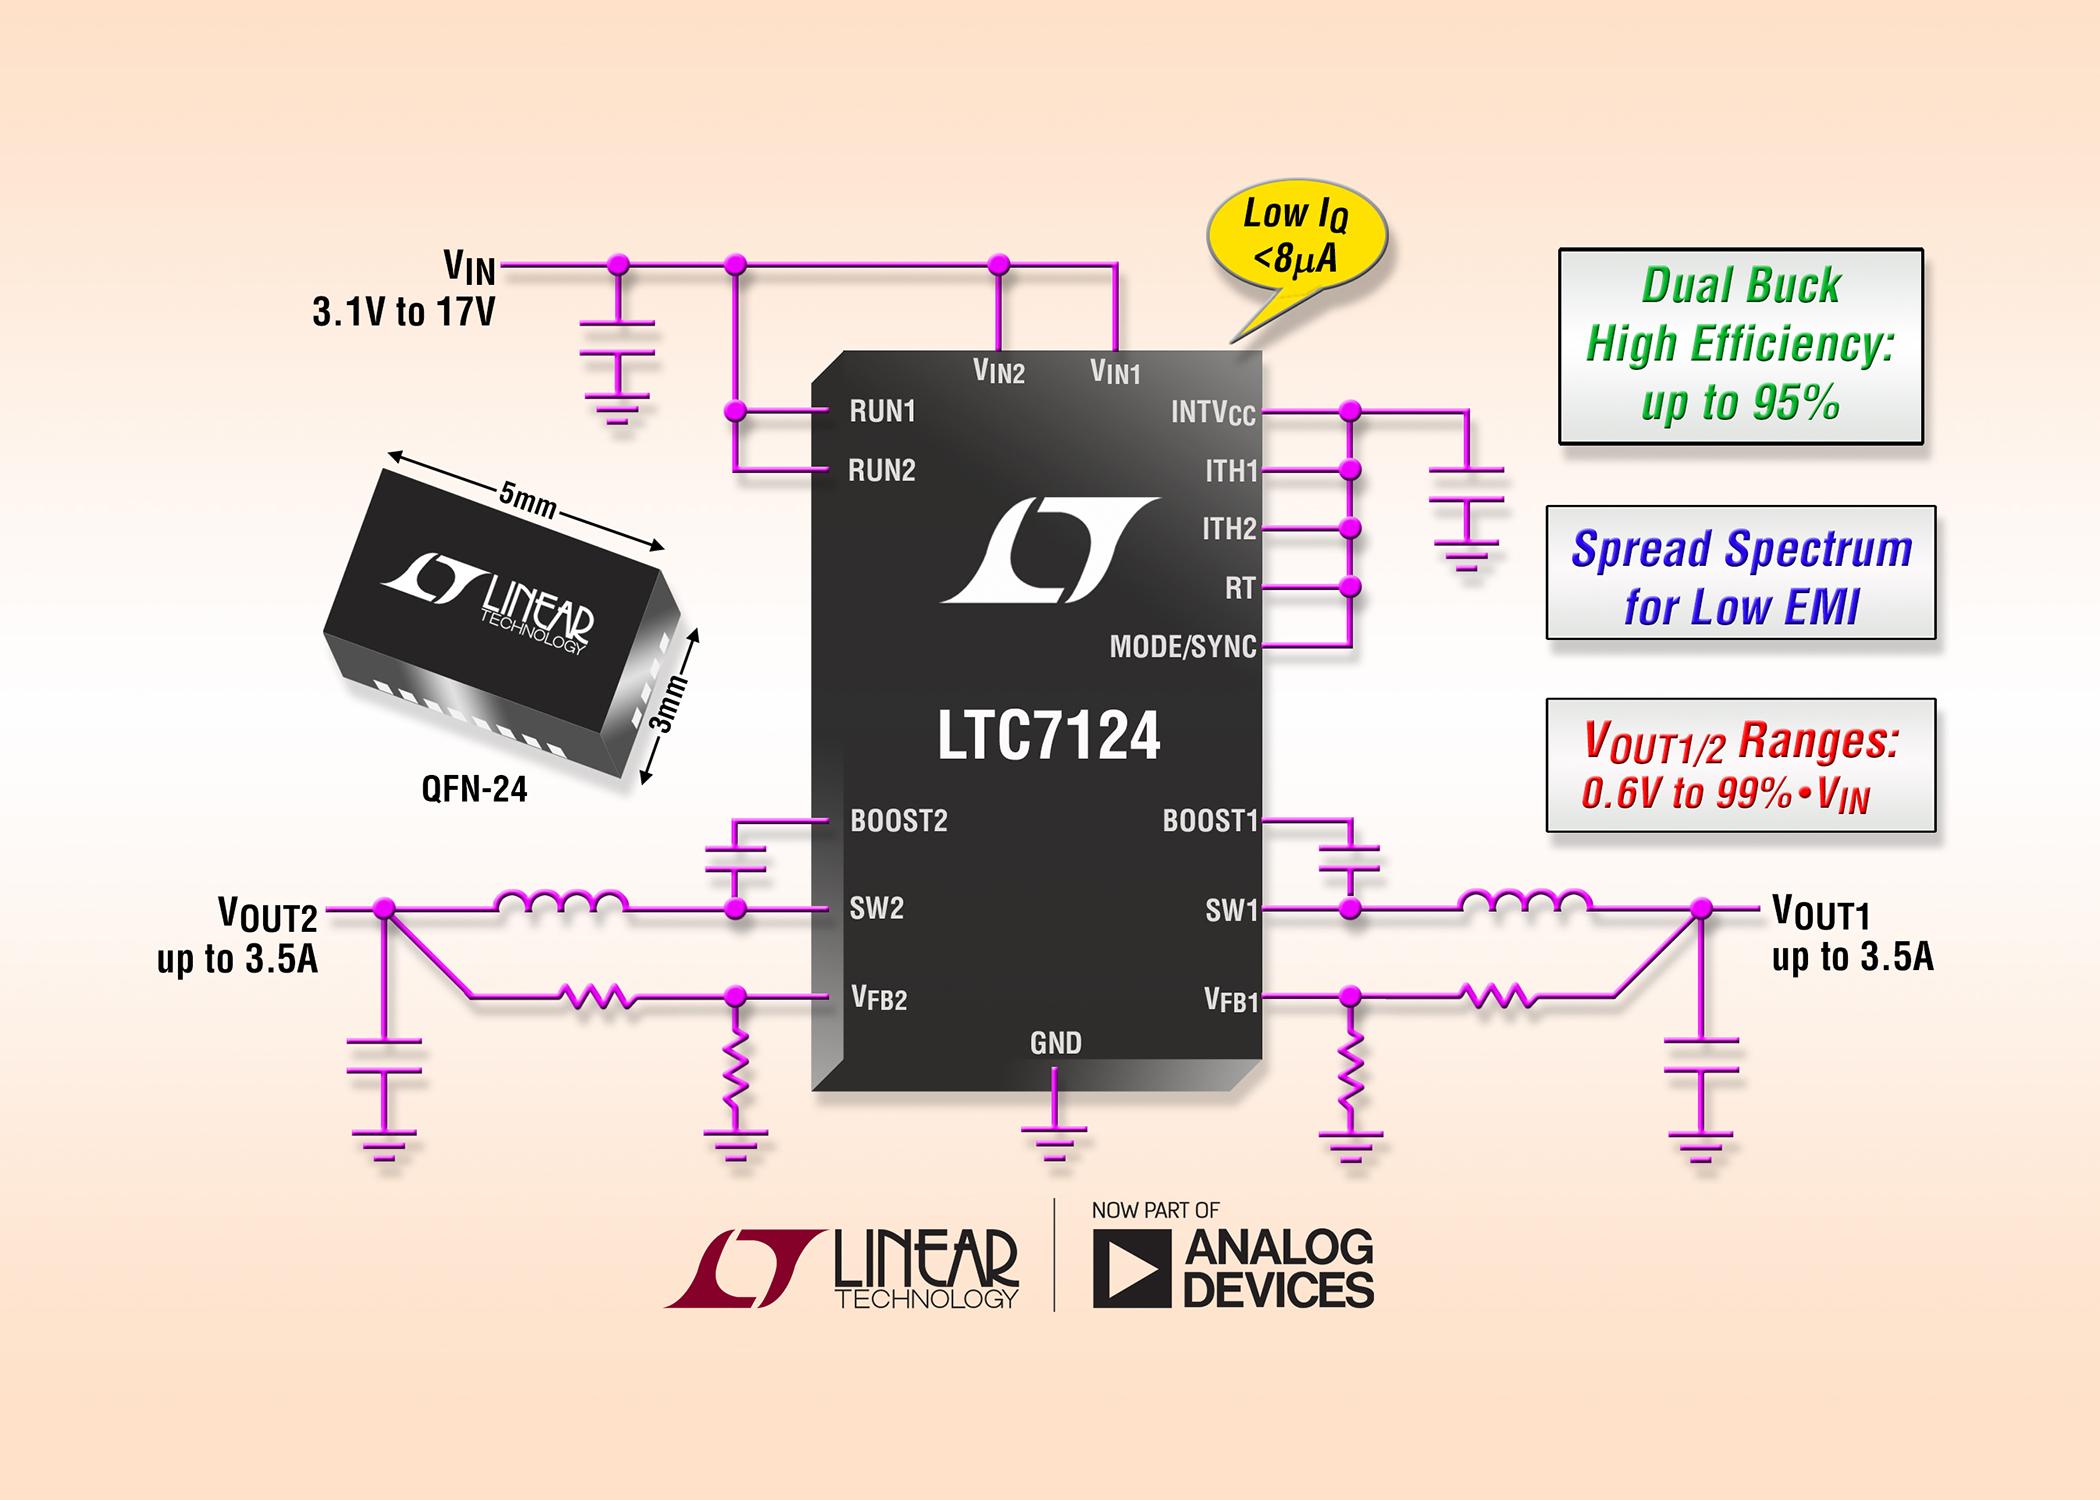 Synchronous buck regulator with spread spectrum modulation